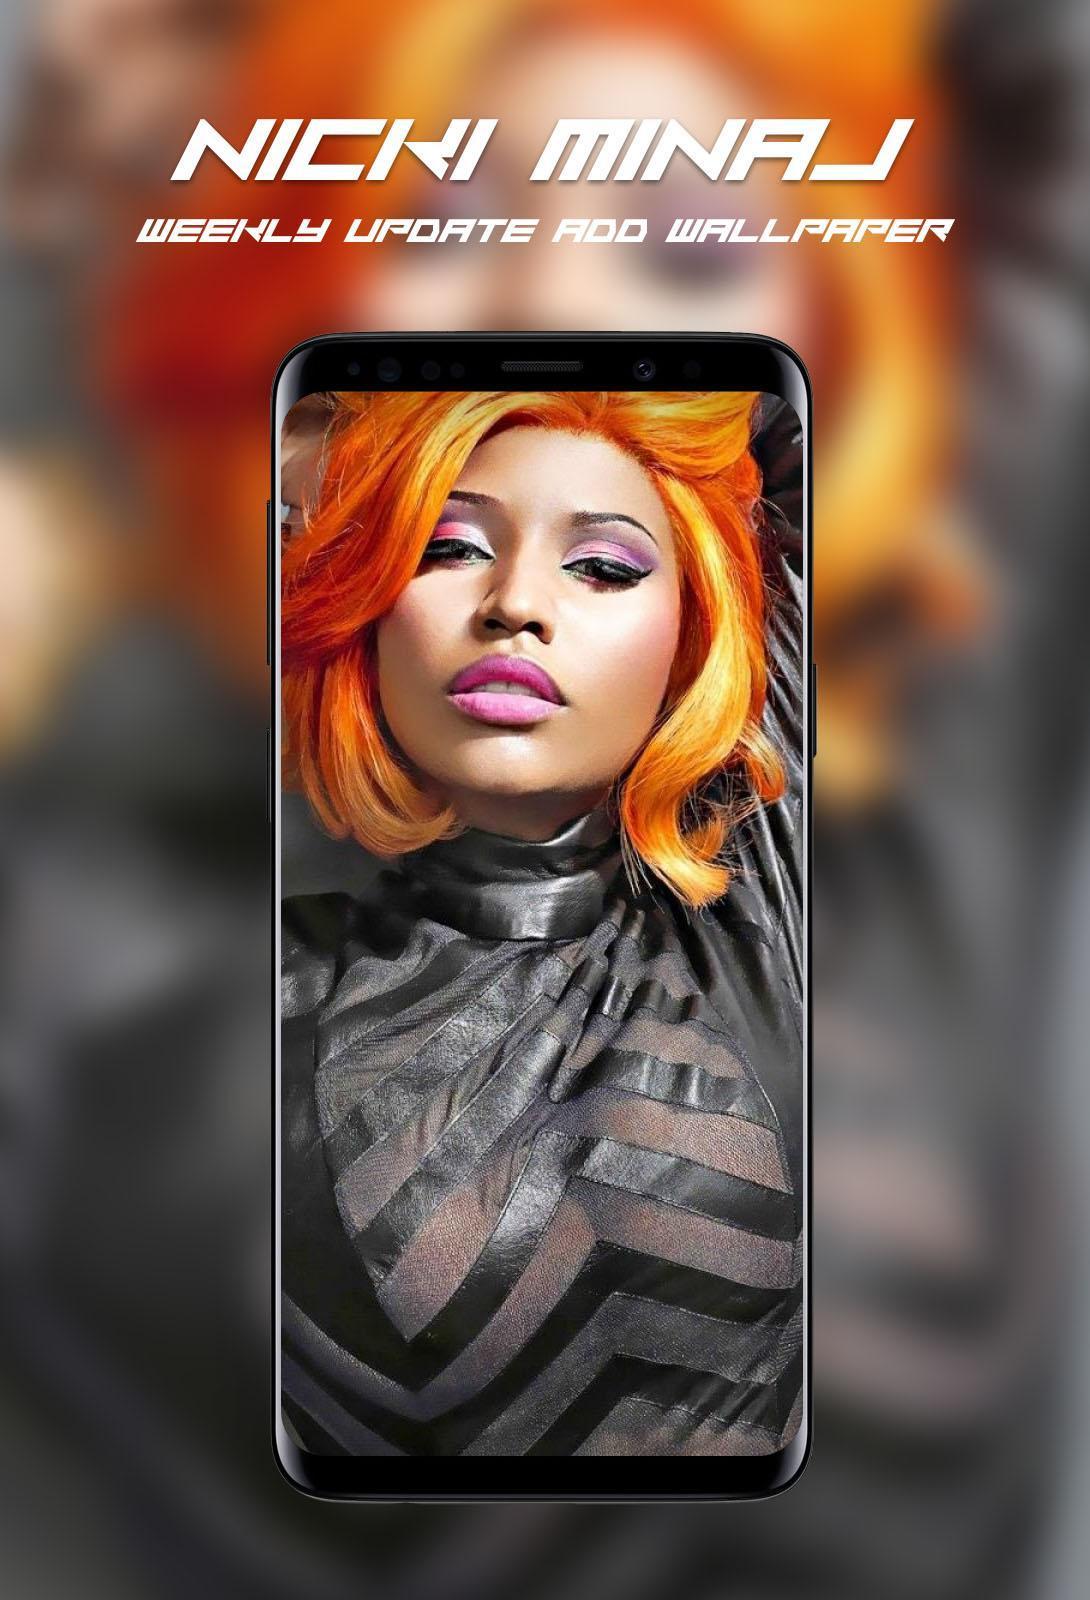 Nicki Minaj Wallpaper Hd 4k For Android Apk Download